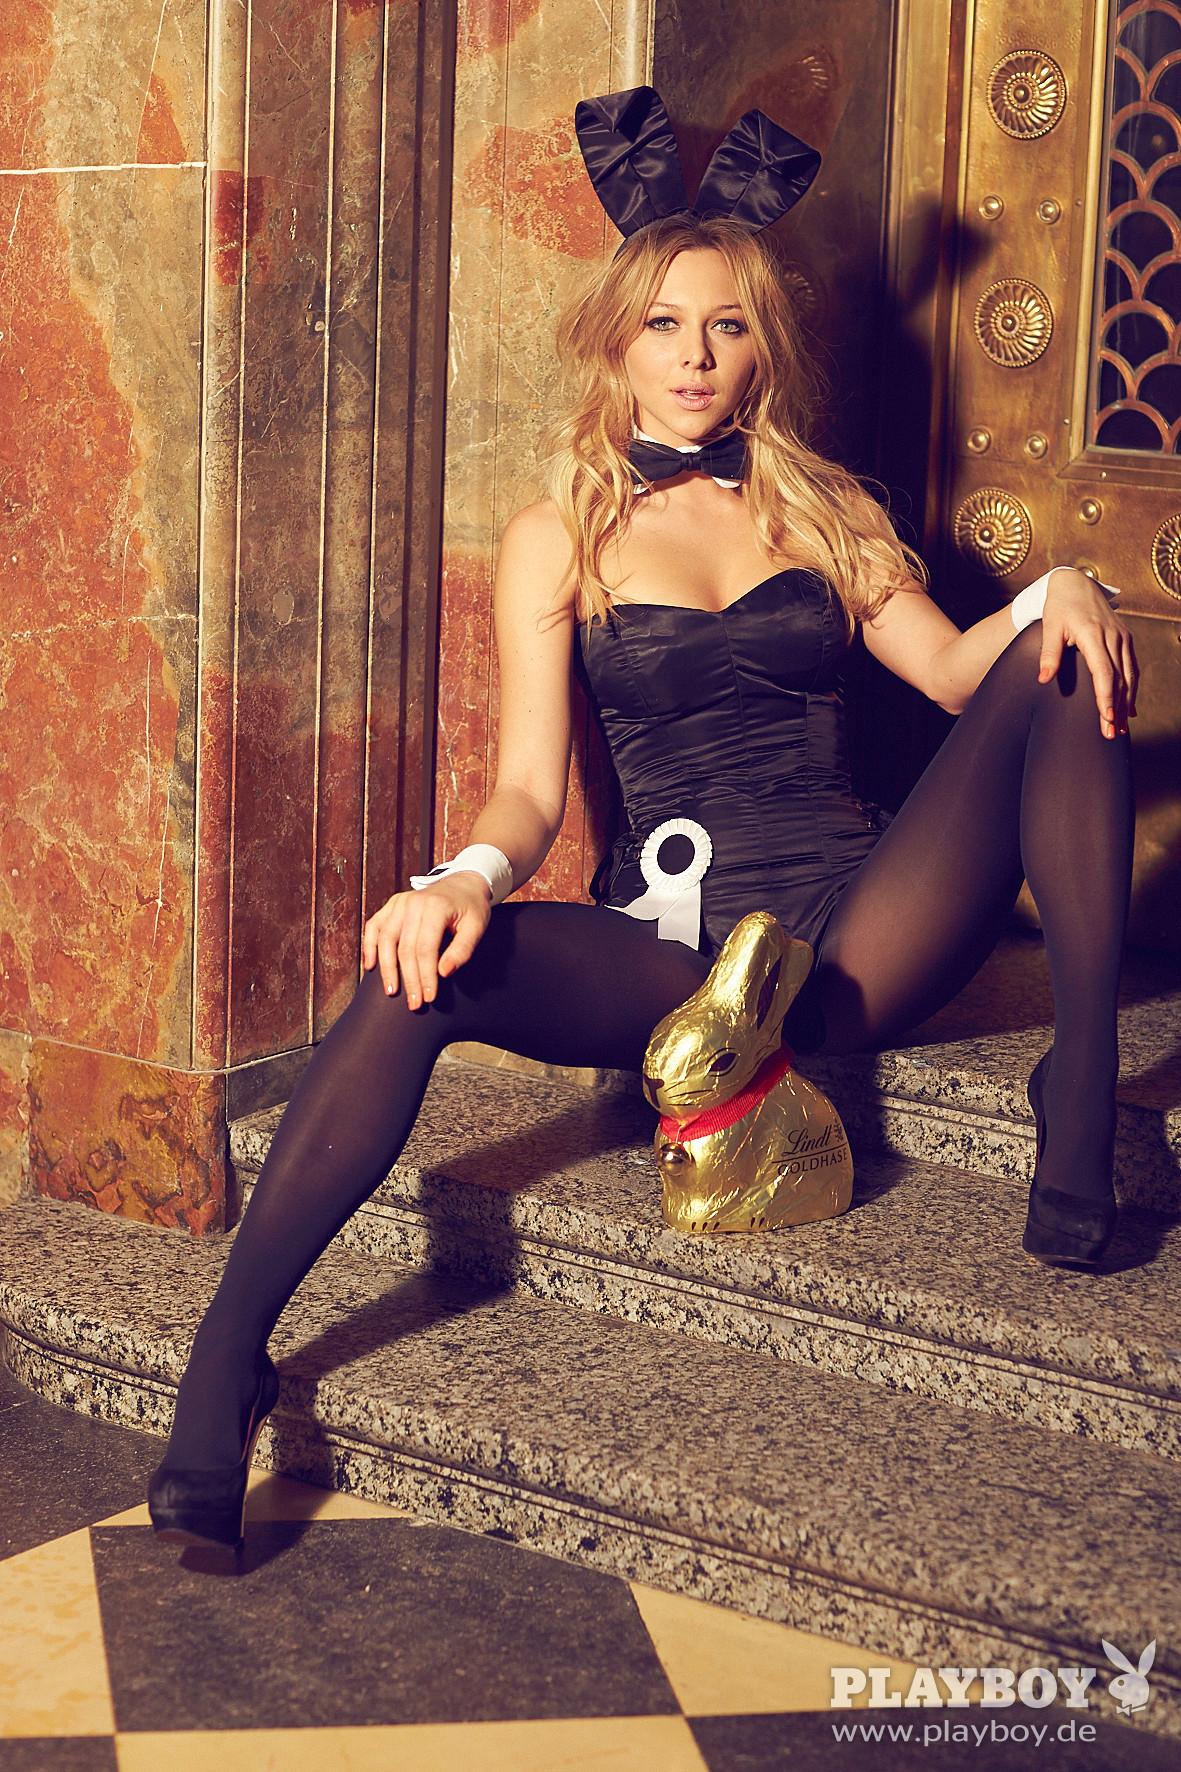 [18+!] Galeria od Playboya na Swieta - Jessica Czakon - za free